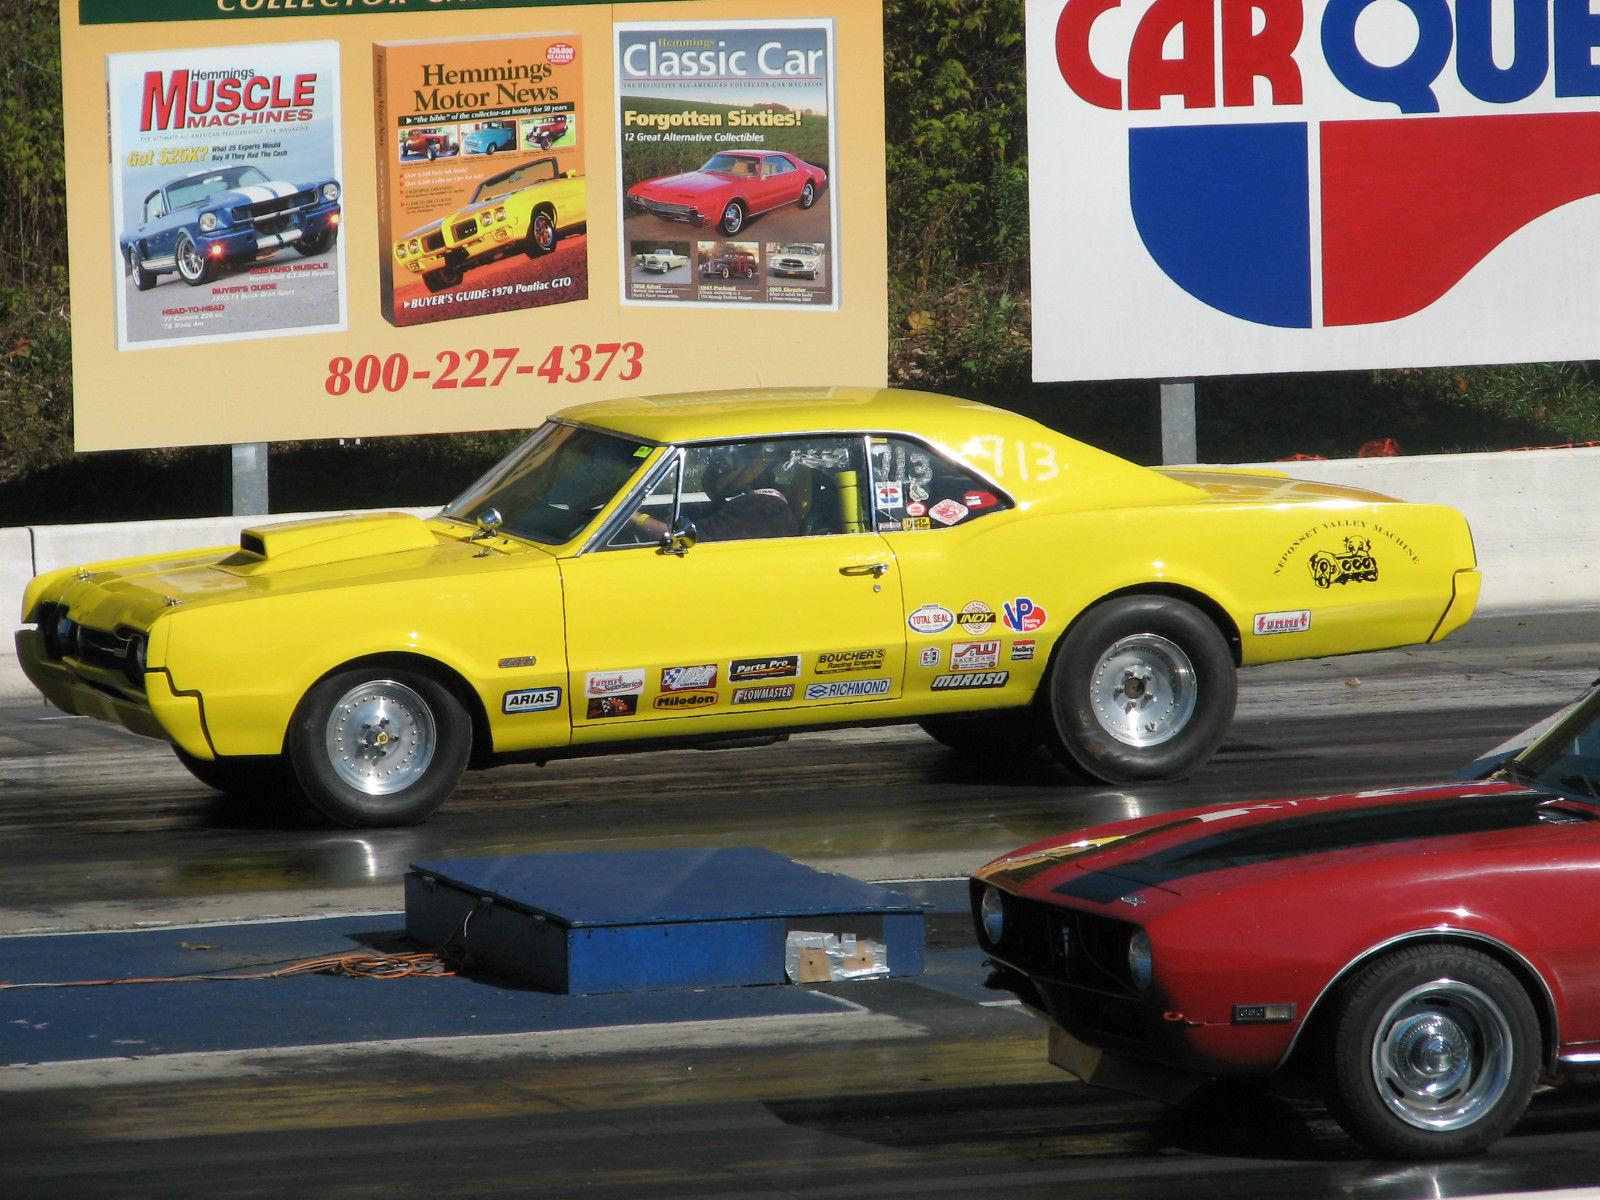 1967 67 cutlass Real 442 solid body, street strip, drag race